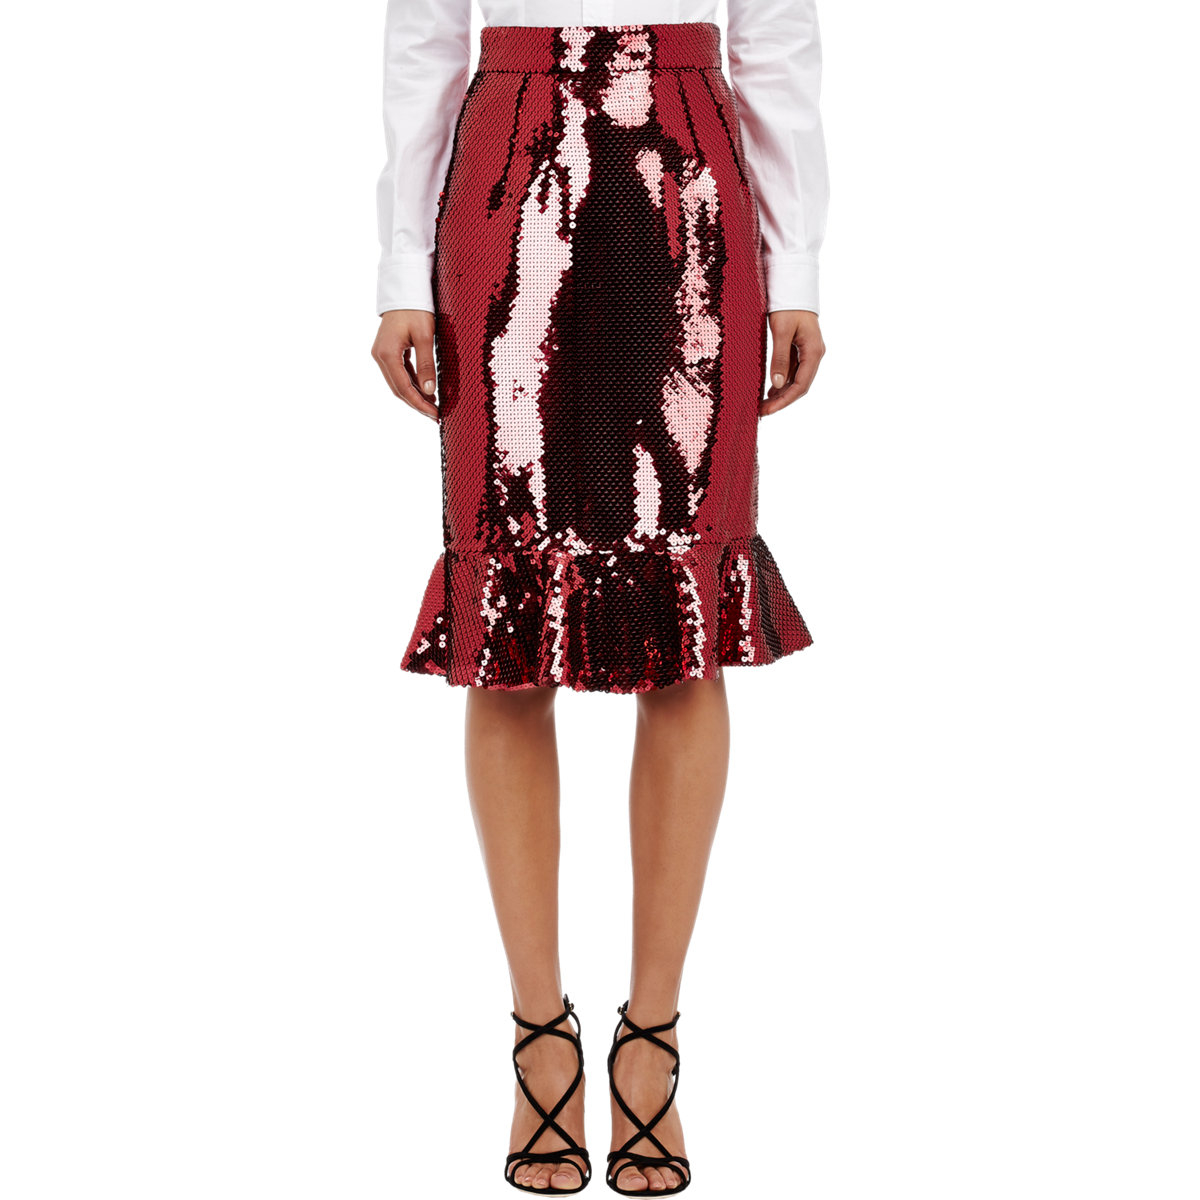 Dolce & gabbana Sequin Trumpet Skirt in Red | Lyst